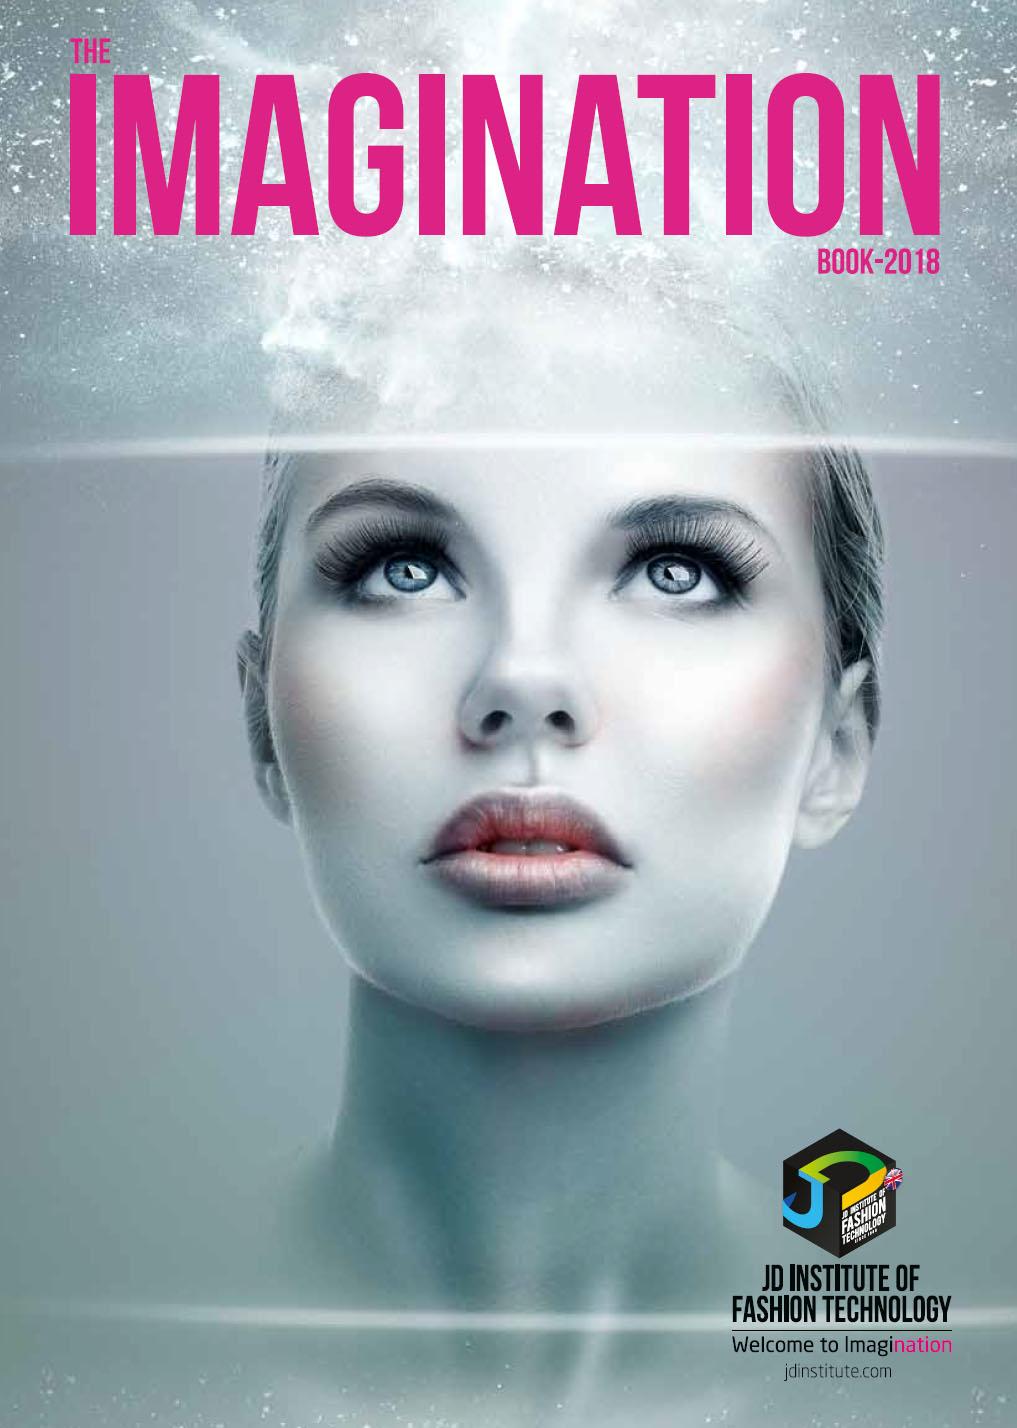 best college for fashion designing Imagination Books Imagination Book 2018 Cover